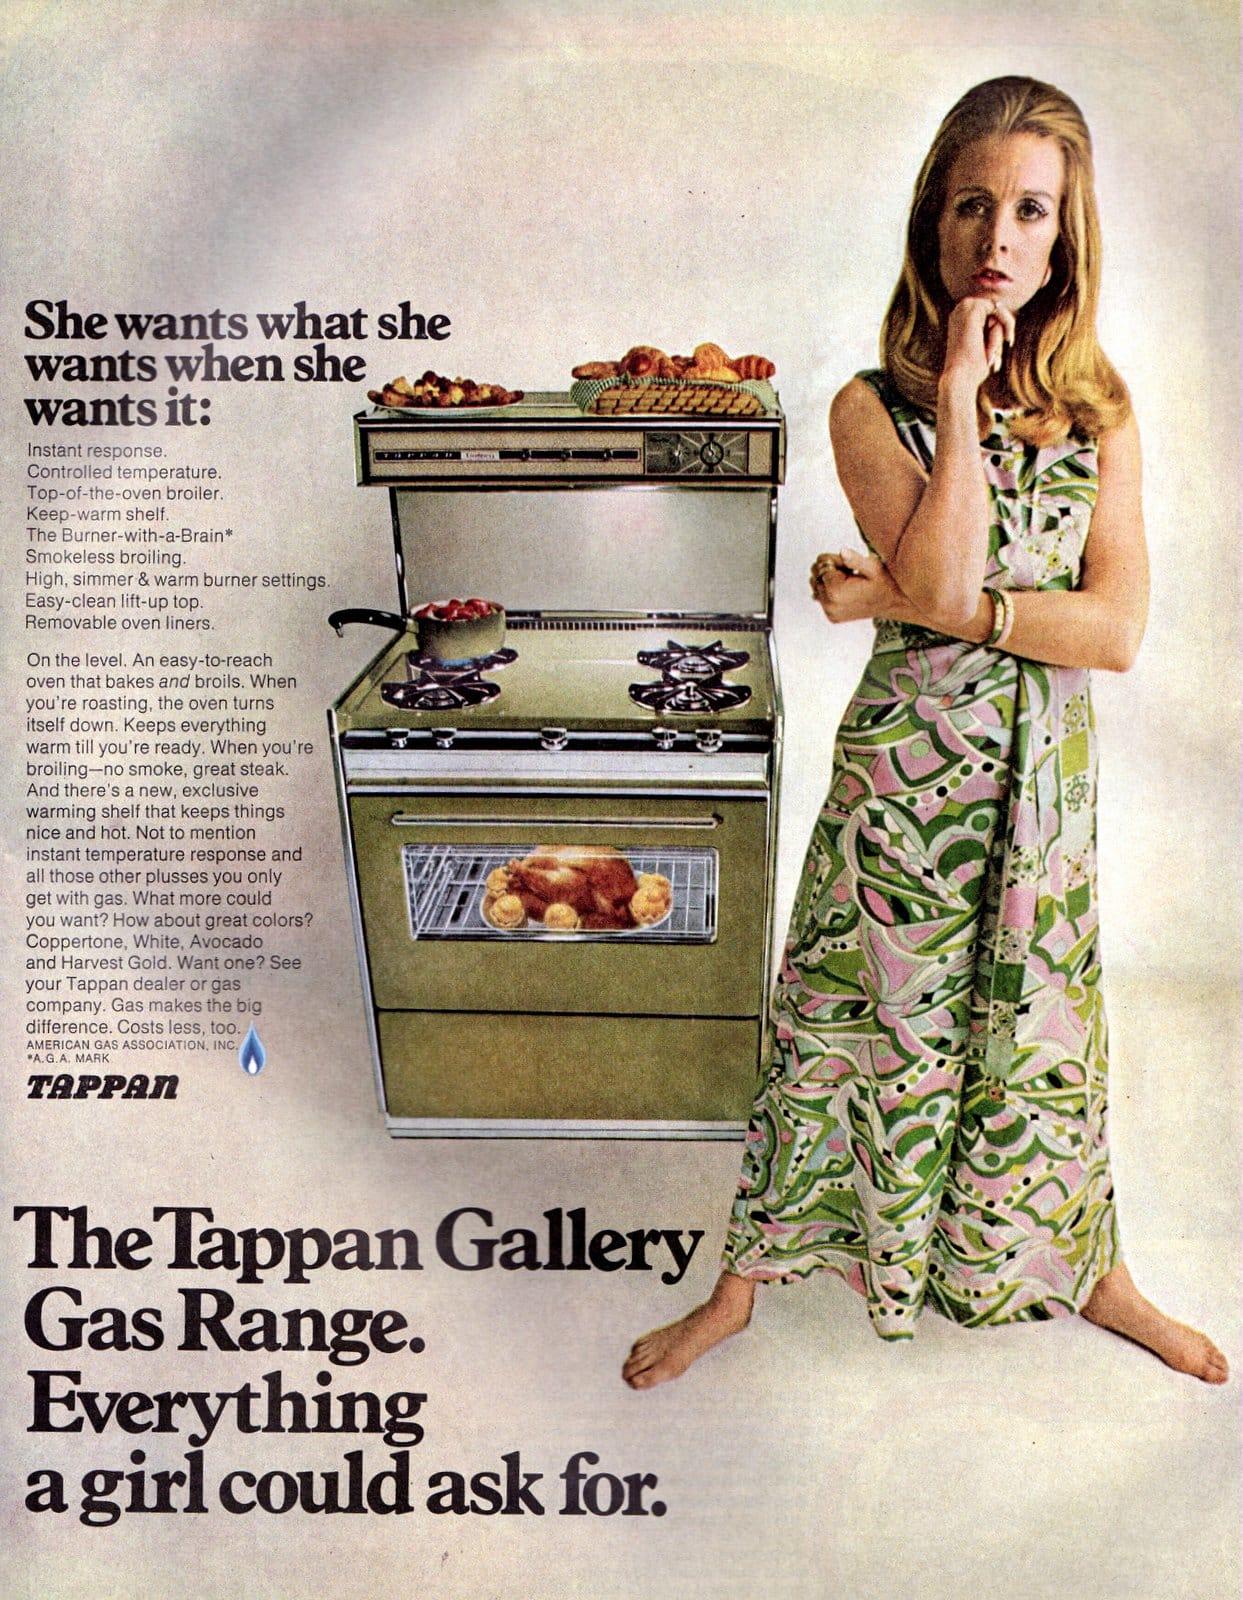 The Tappan Gallery Gas Range (1968)